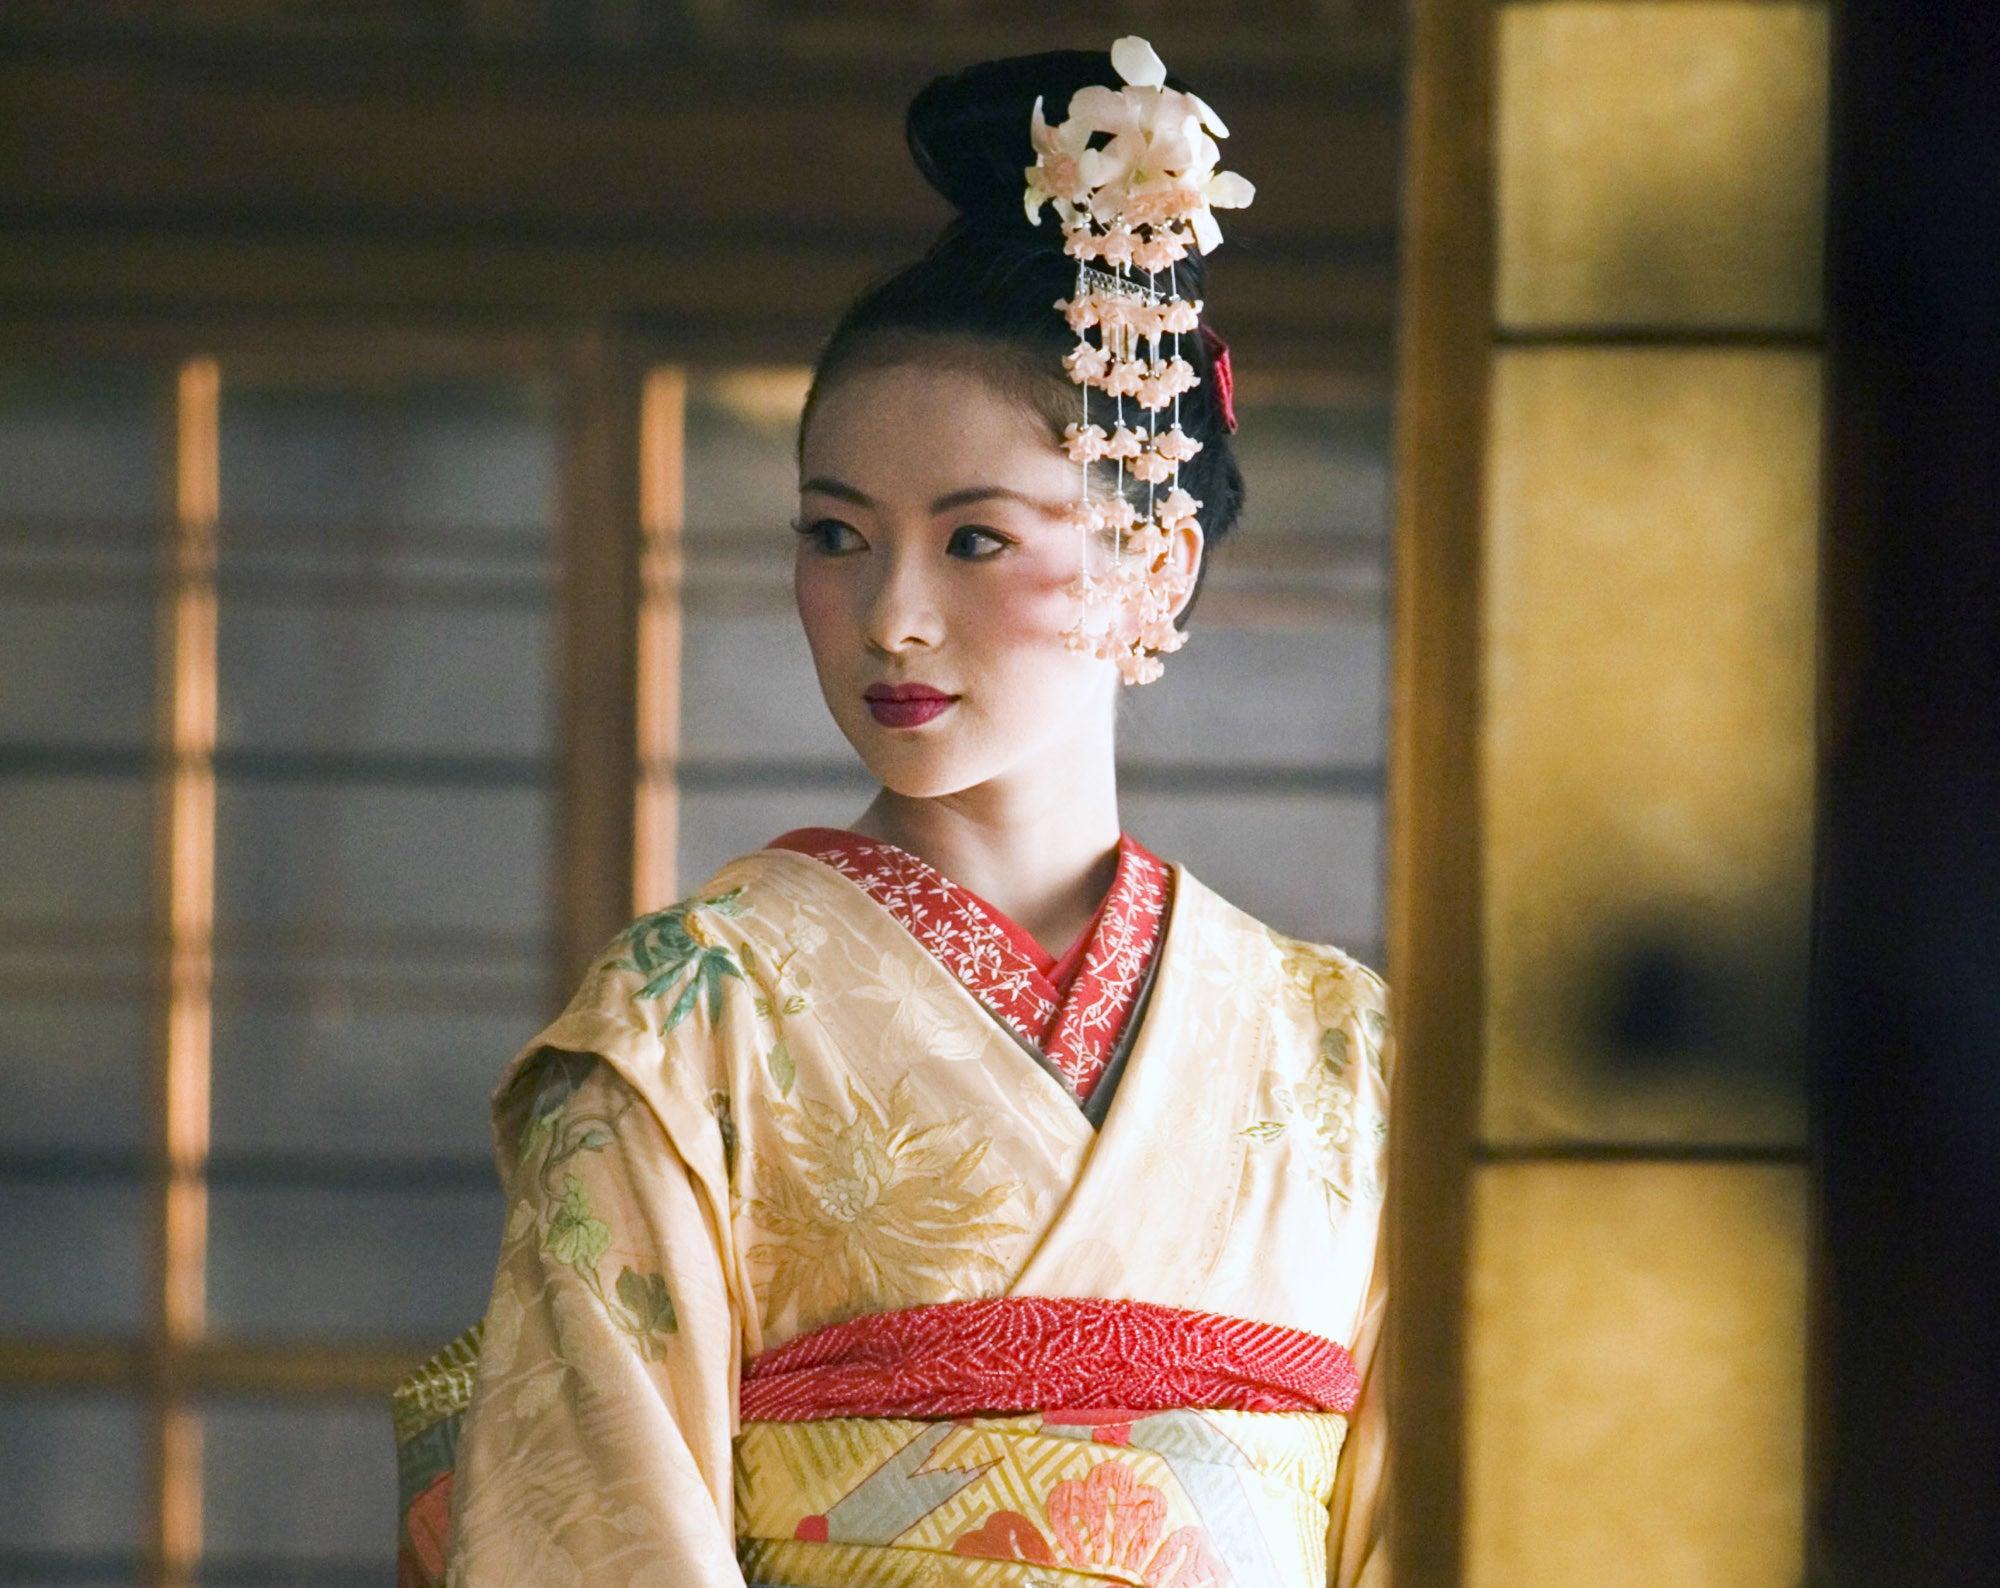 Ziyi Zhang as Chiyo dressed in traditional Geisha dress.